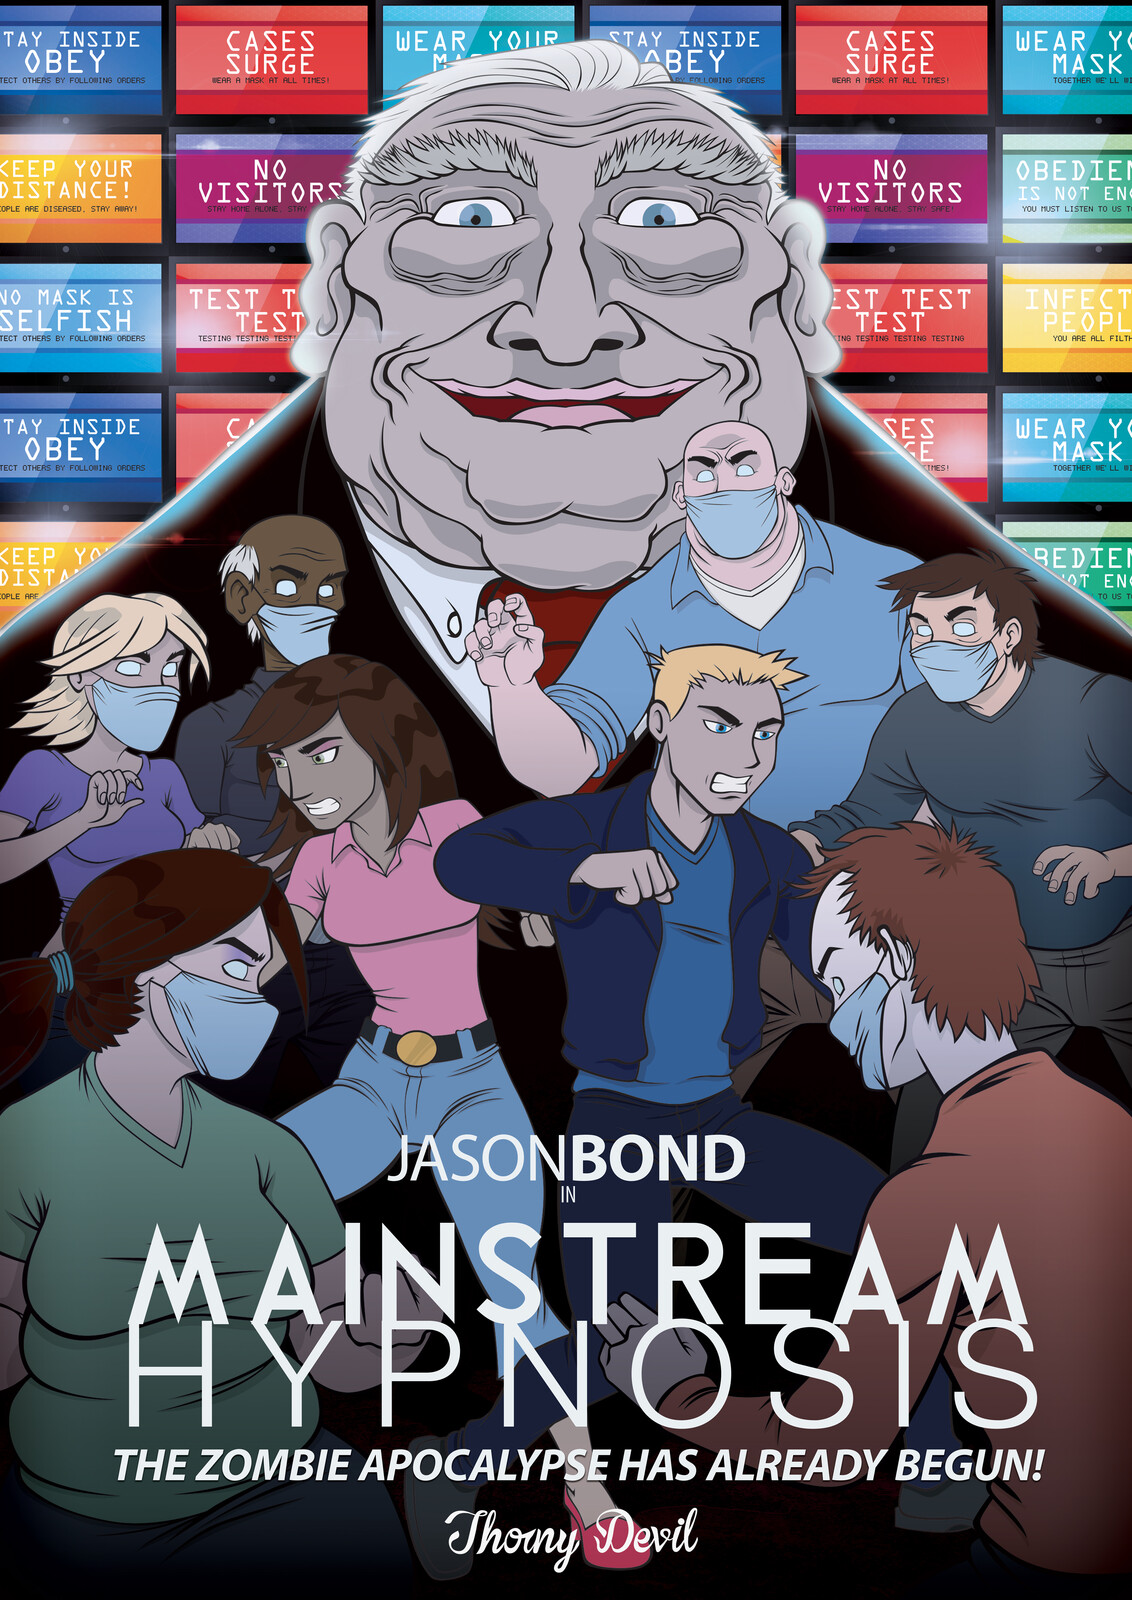 Jason Bond poster